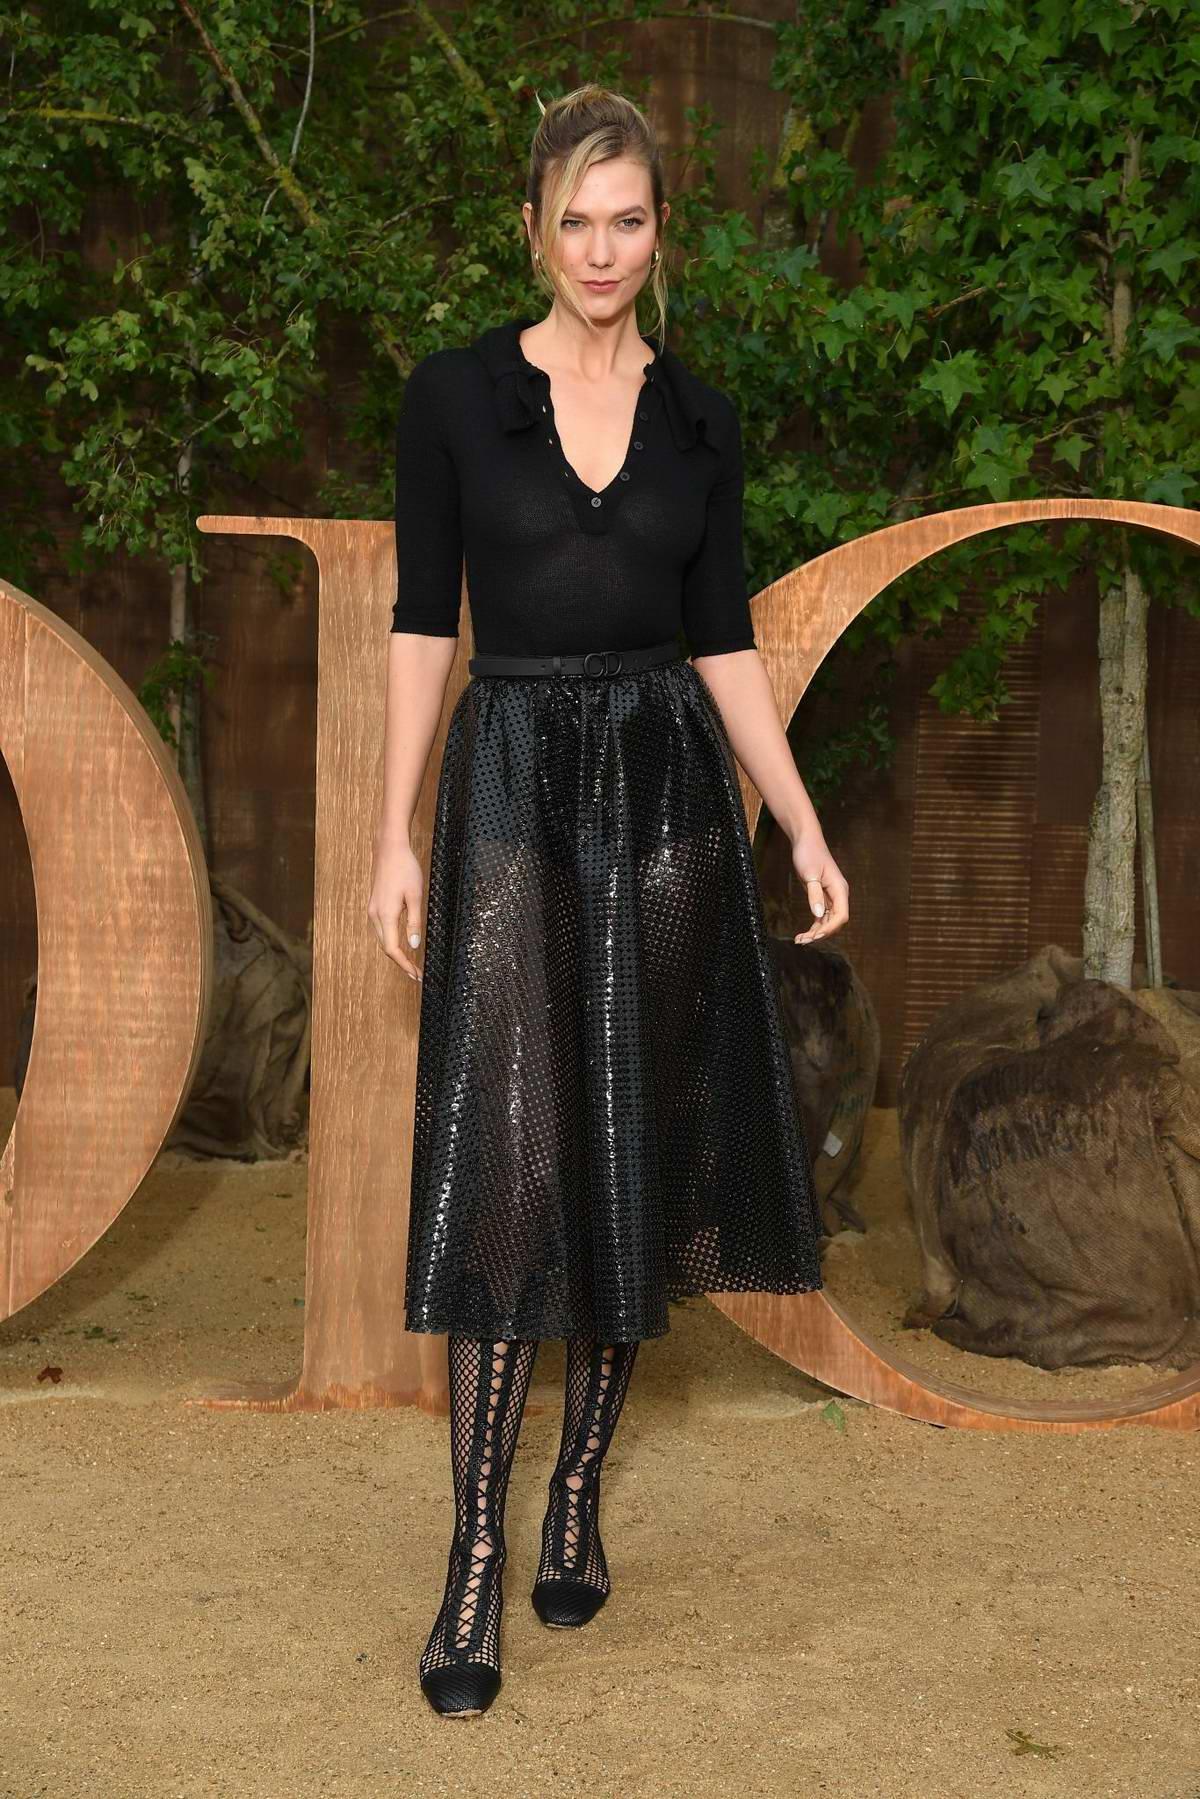 Karlie Kloss attends Christian Dior show, Womenswear SS 2020 during Paris Fashion Week in Paris, France